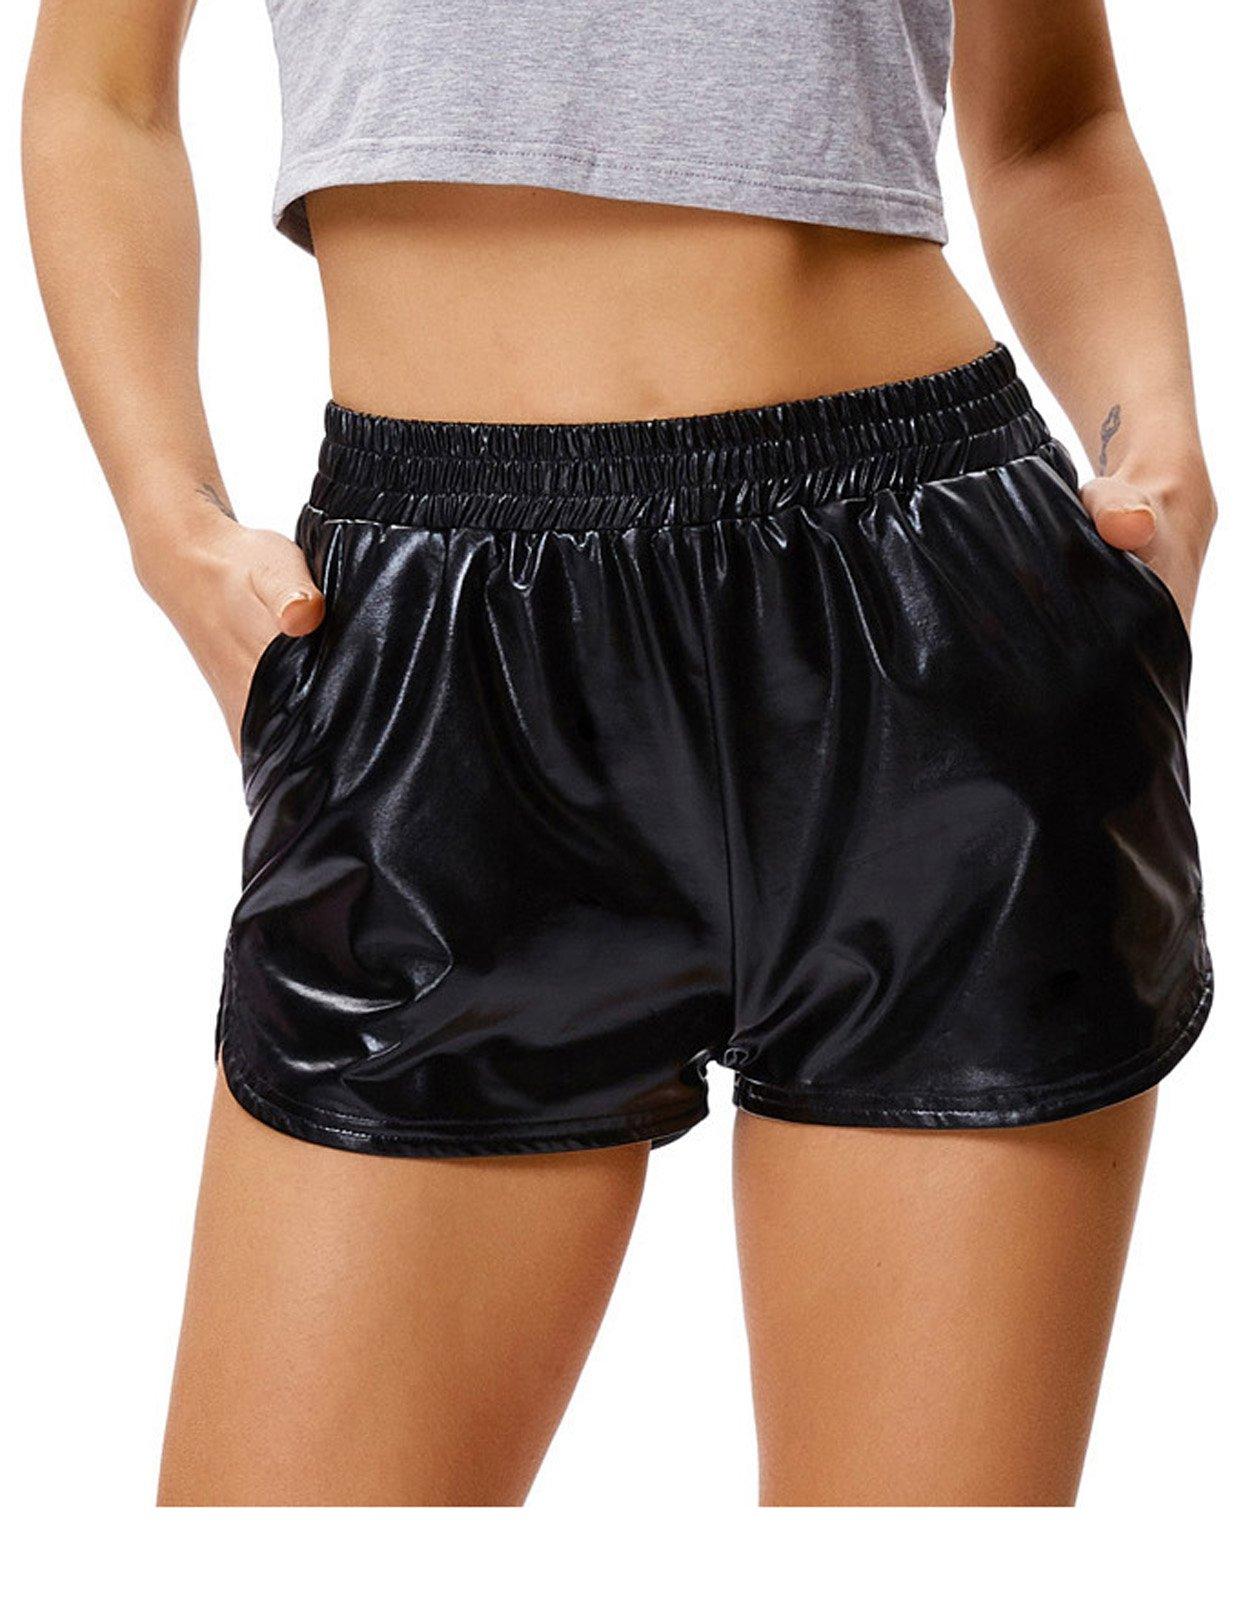 Kate Kasin Sexy Shiny Metallic Yoga Shorts for Women Casual (XL,Black)